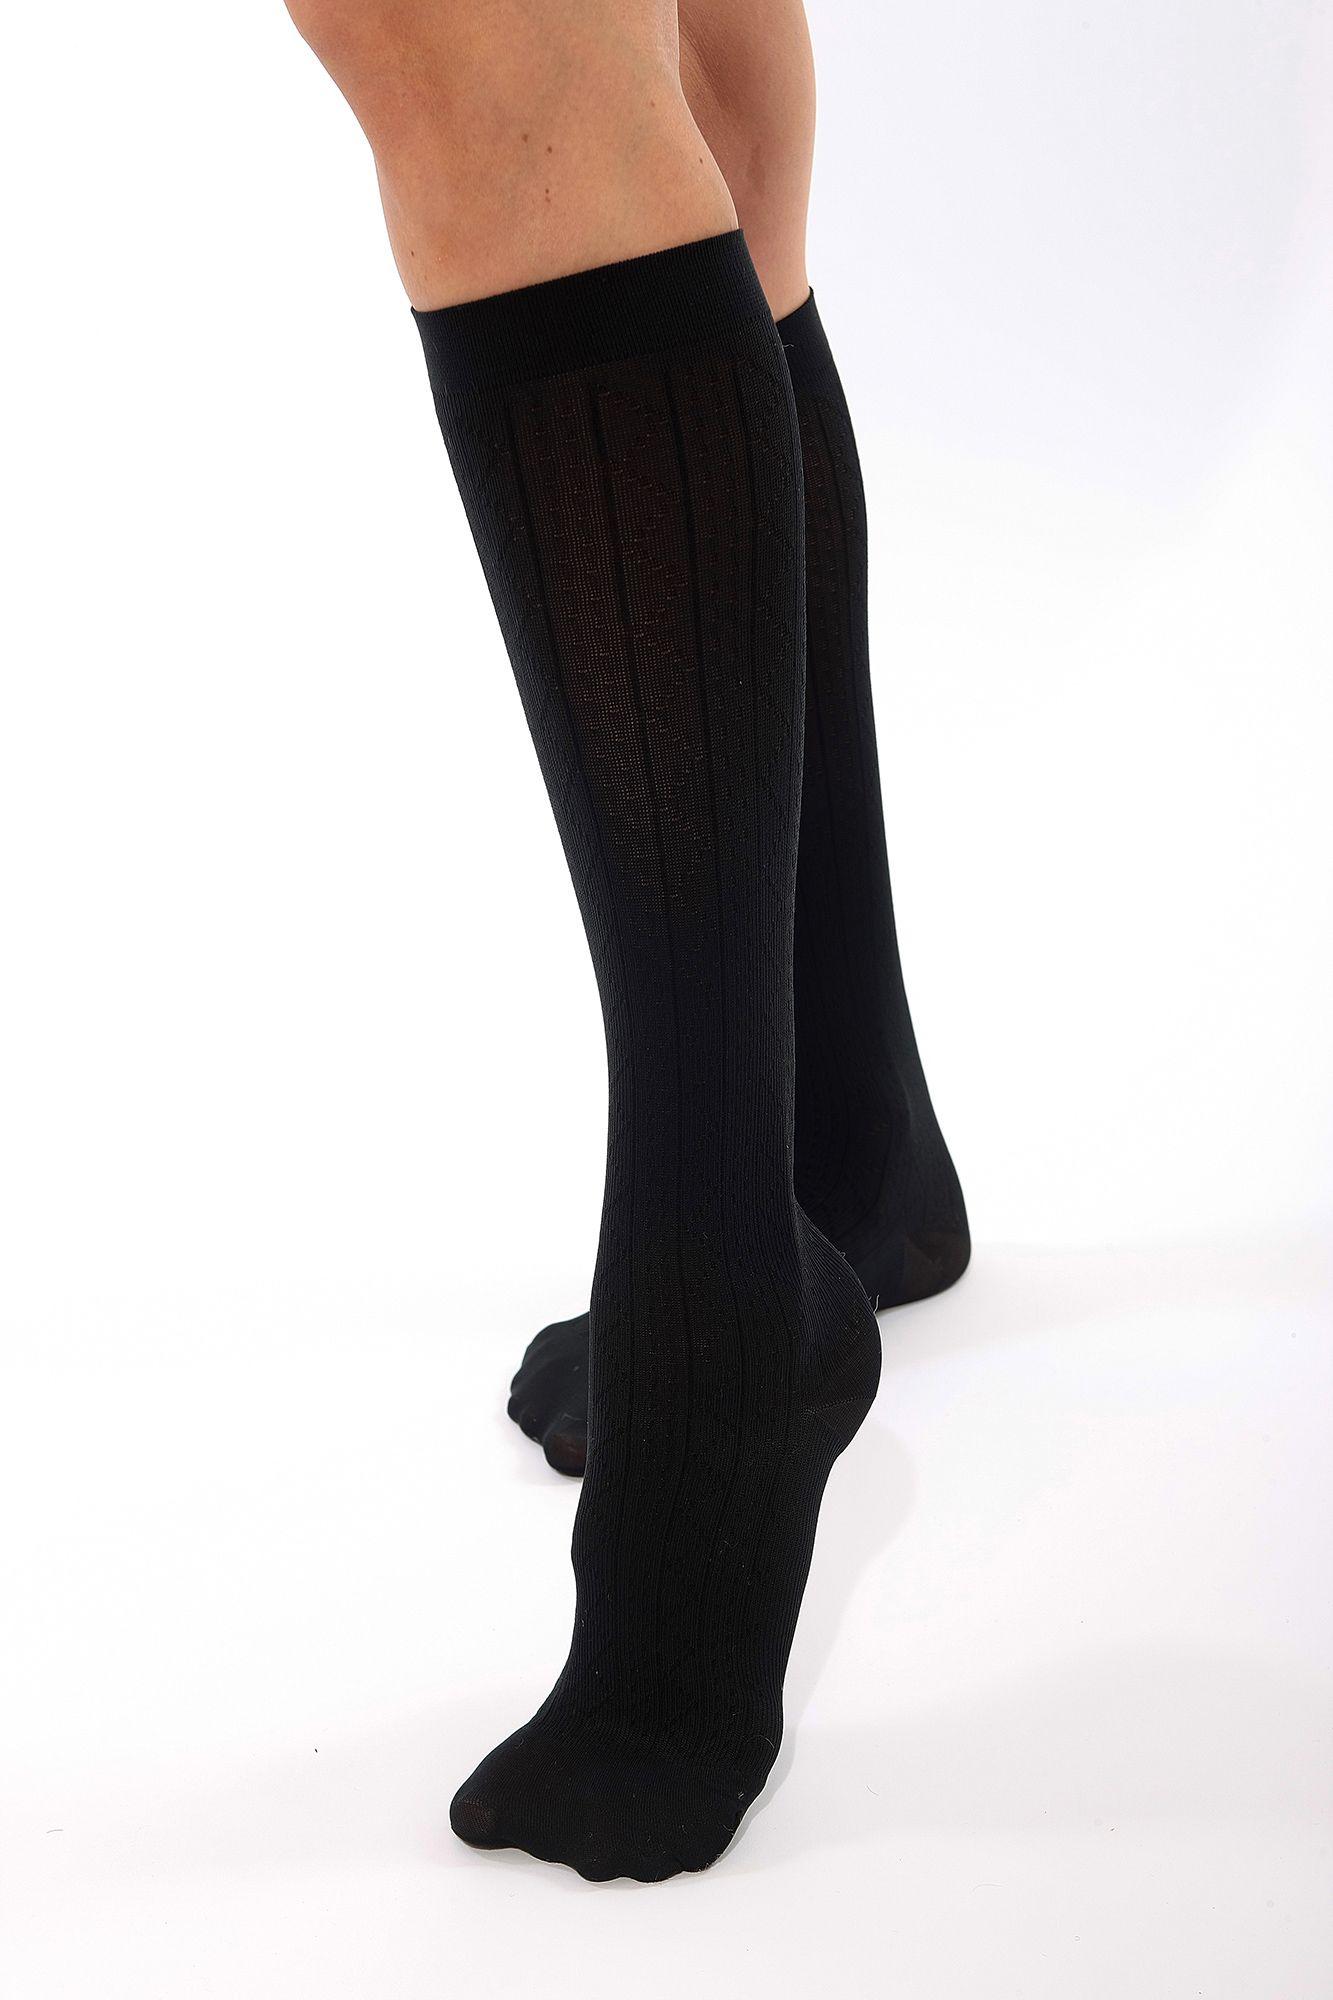 8c0333291d VENOSAN® MicroFiberLine Womens Compression Socks 15-20mmHg - Daylong